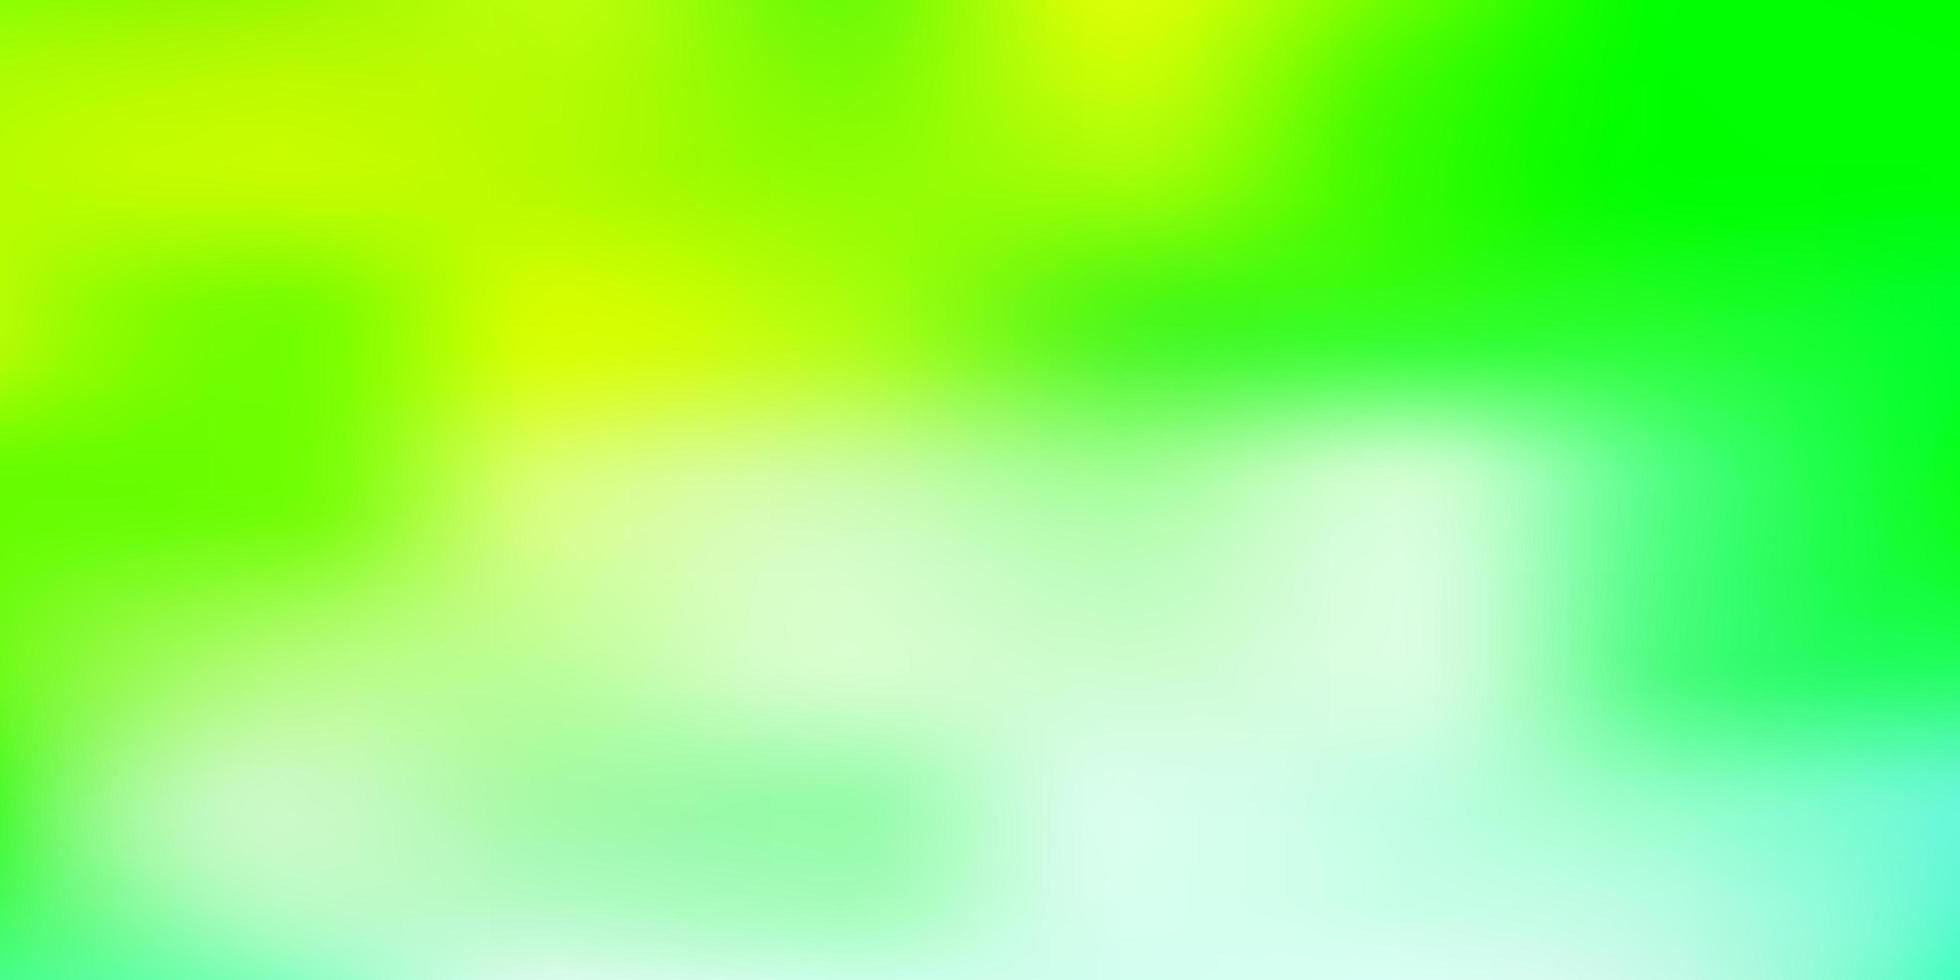 luz azul, verde vetor turva padrão.